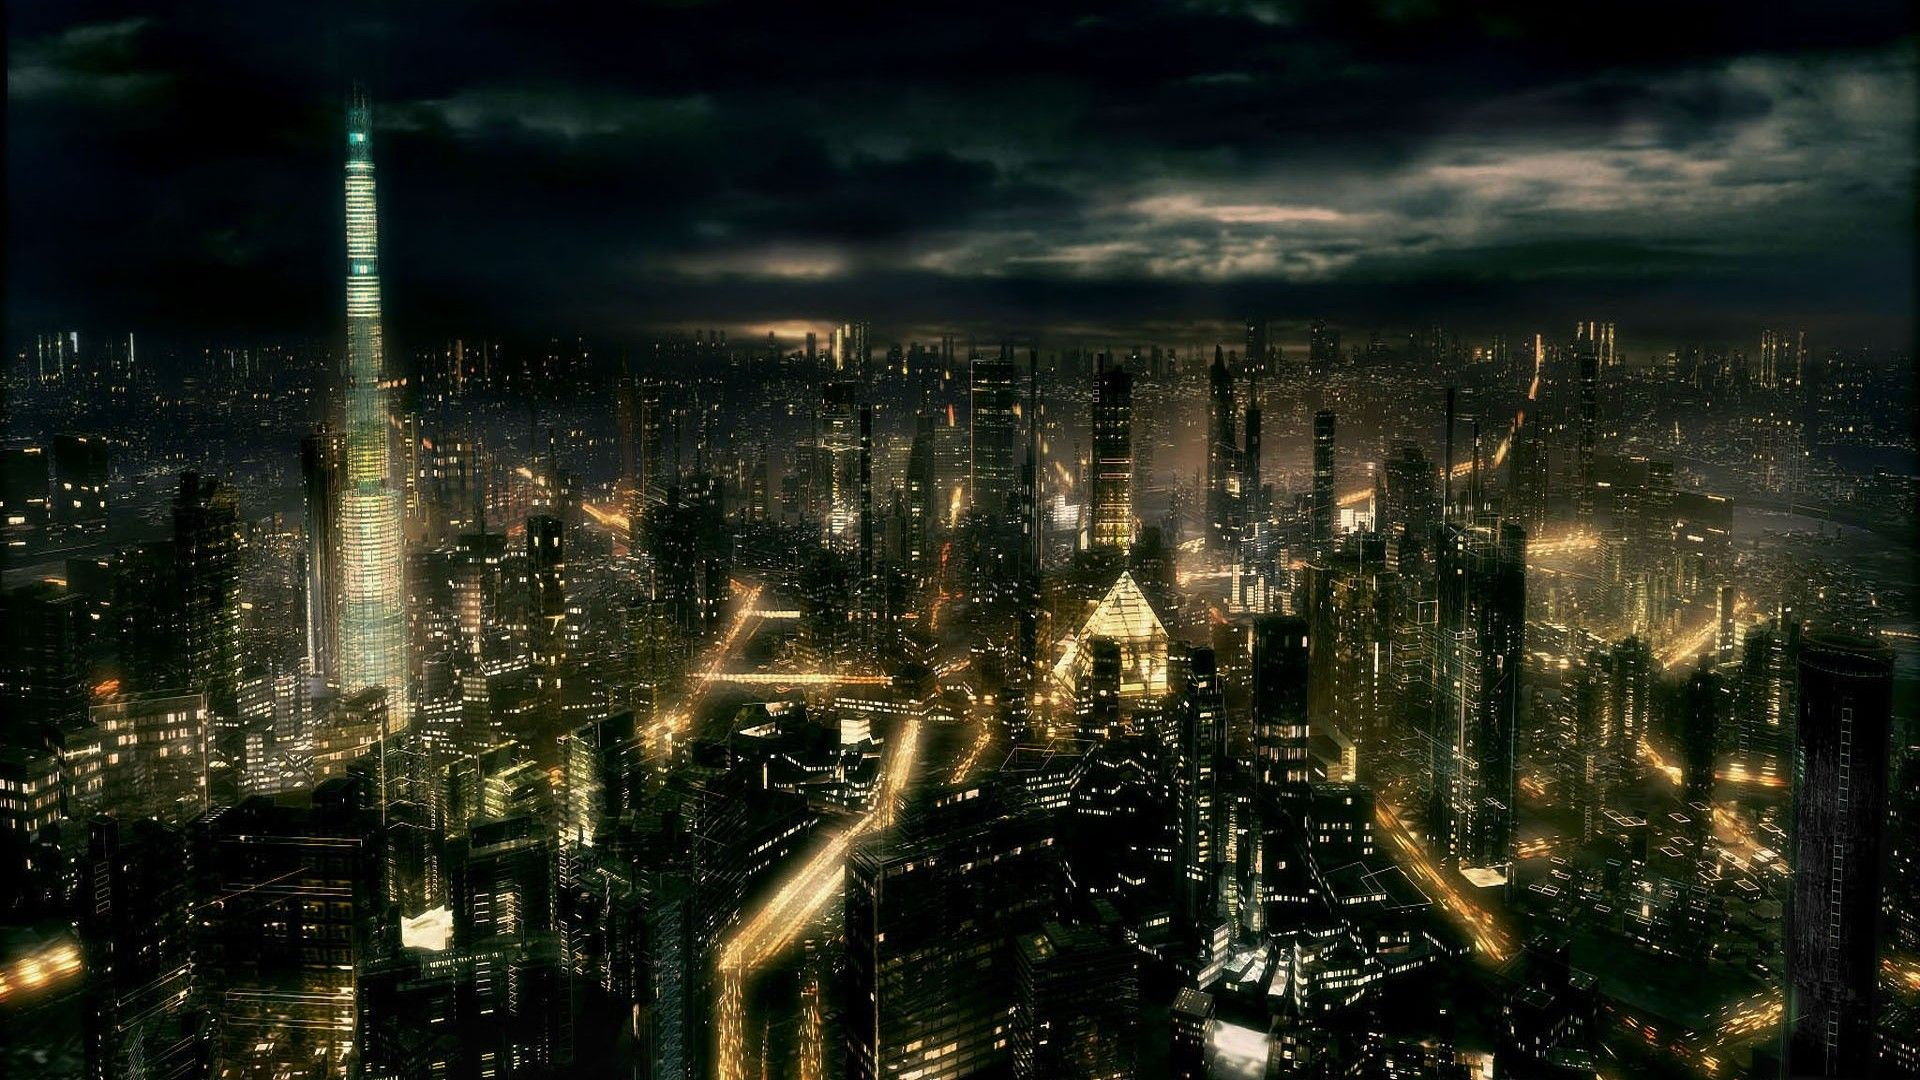 Dark City City Wallpaper Background Images